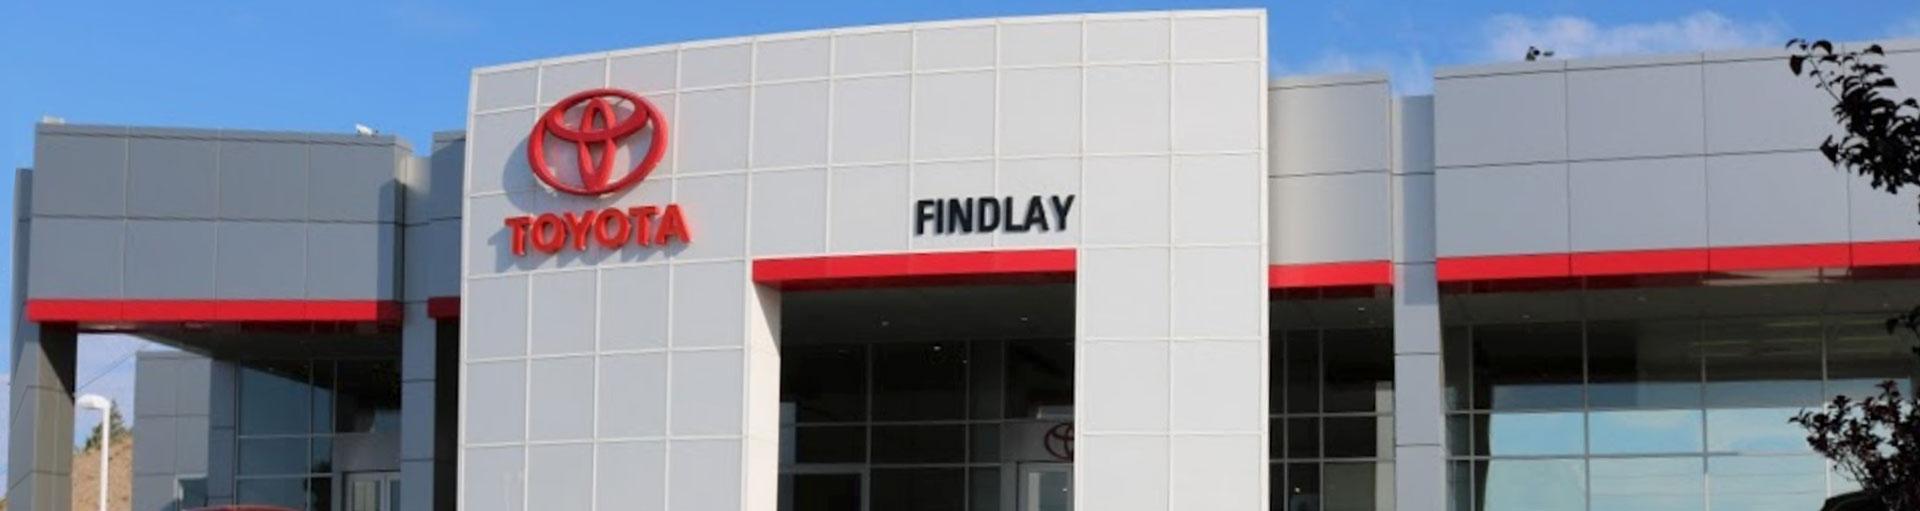 Findlay Toyota Service